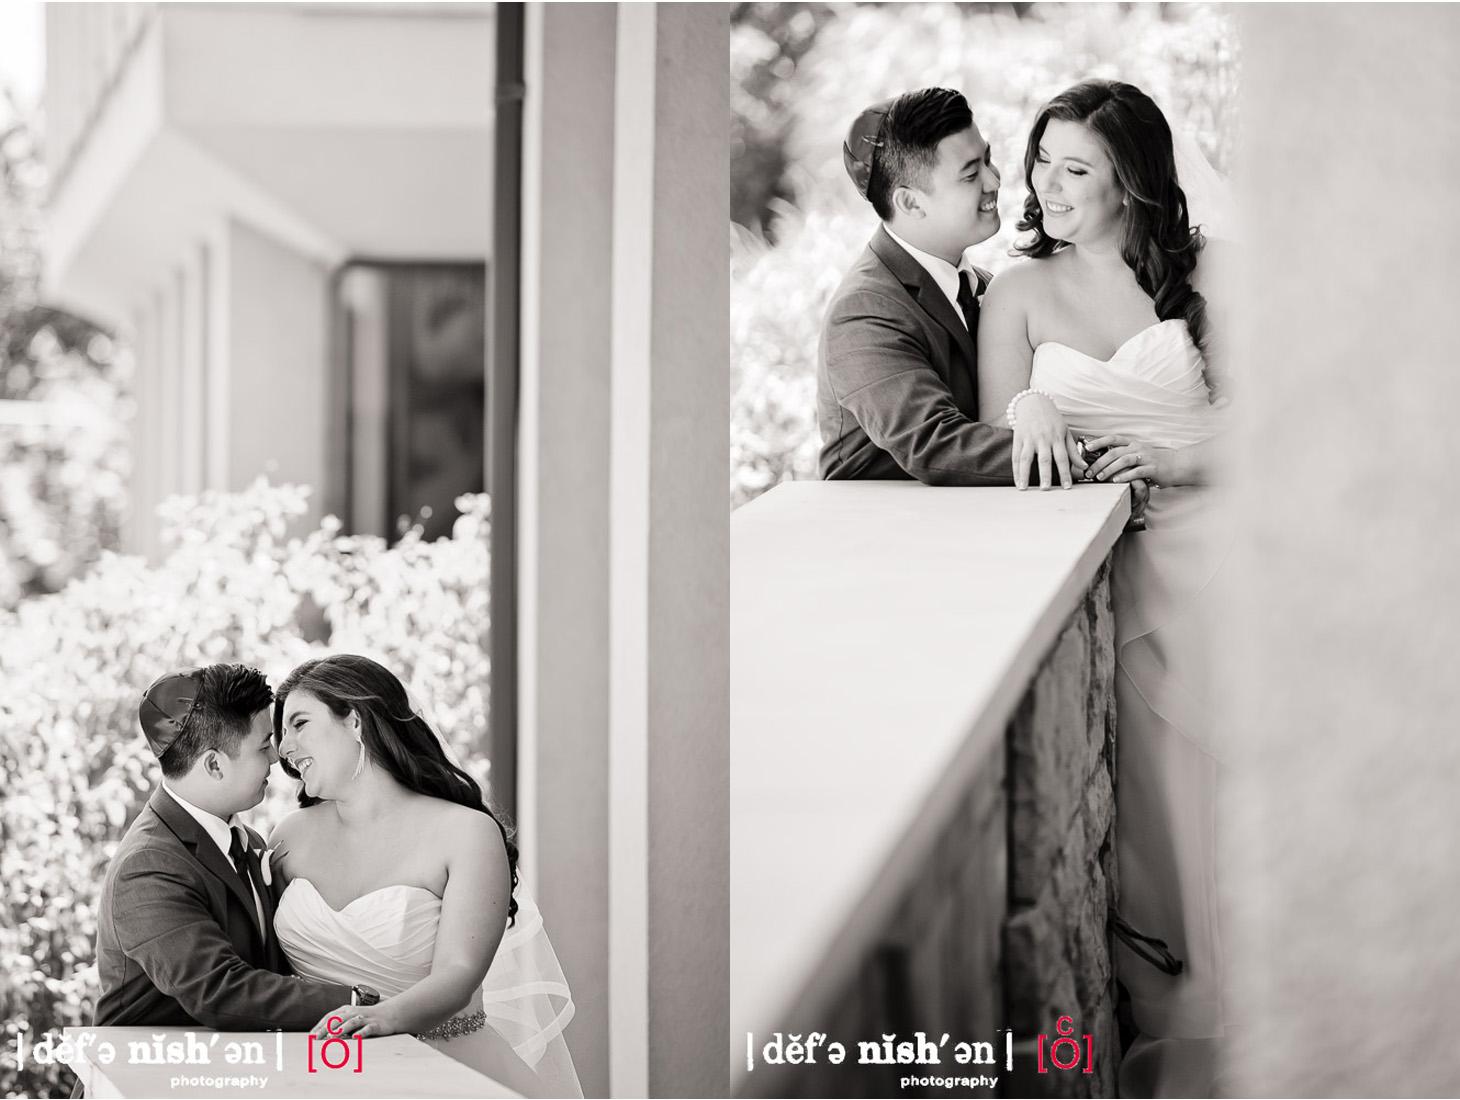 Definition Photography - Beth Emmeth Wedding - Toronto Ontario(10).jpg